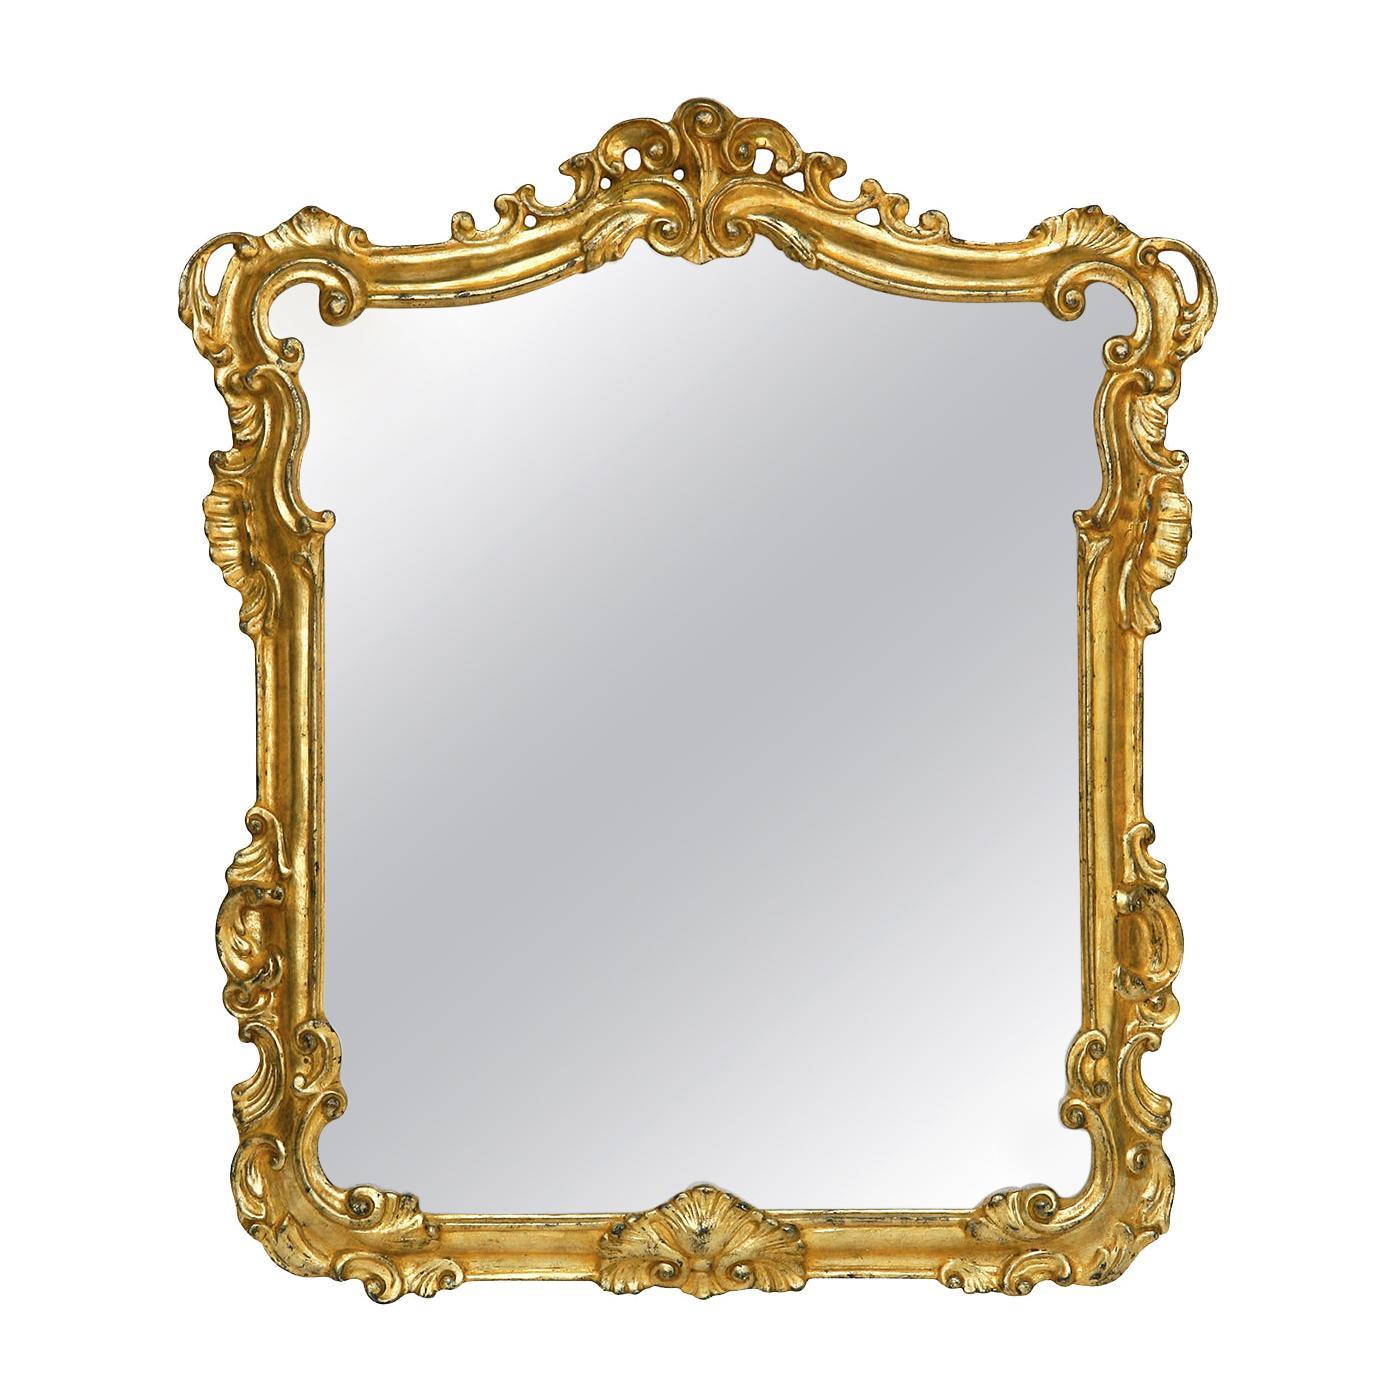 Rectangular Mirror with Gold Leaf